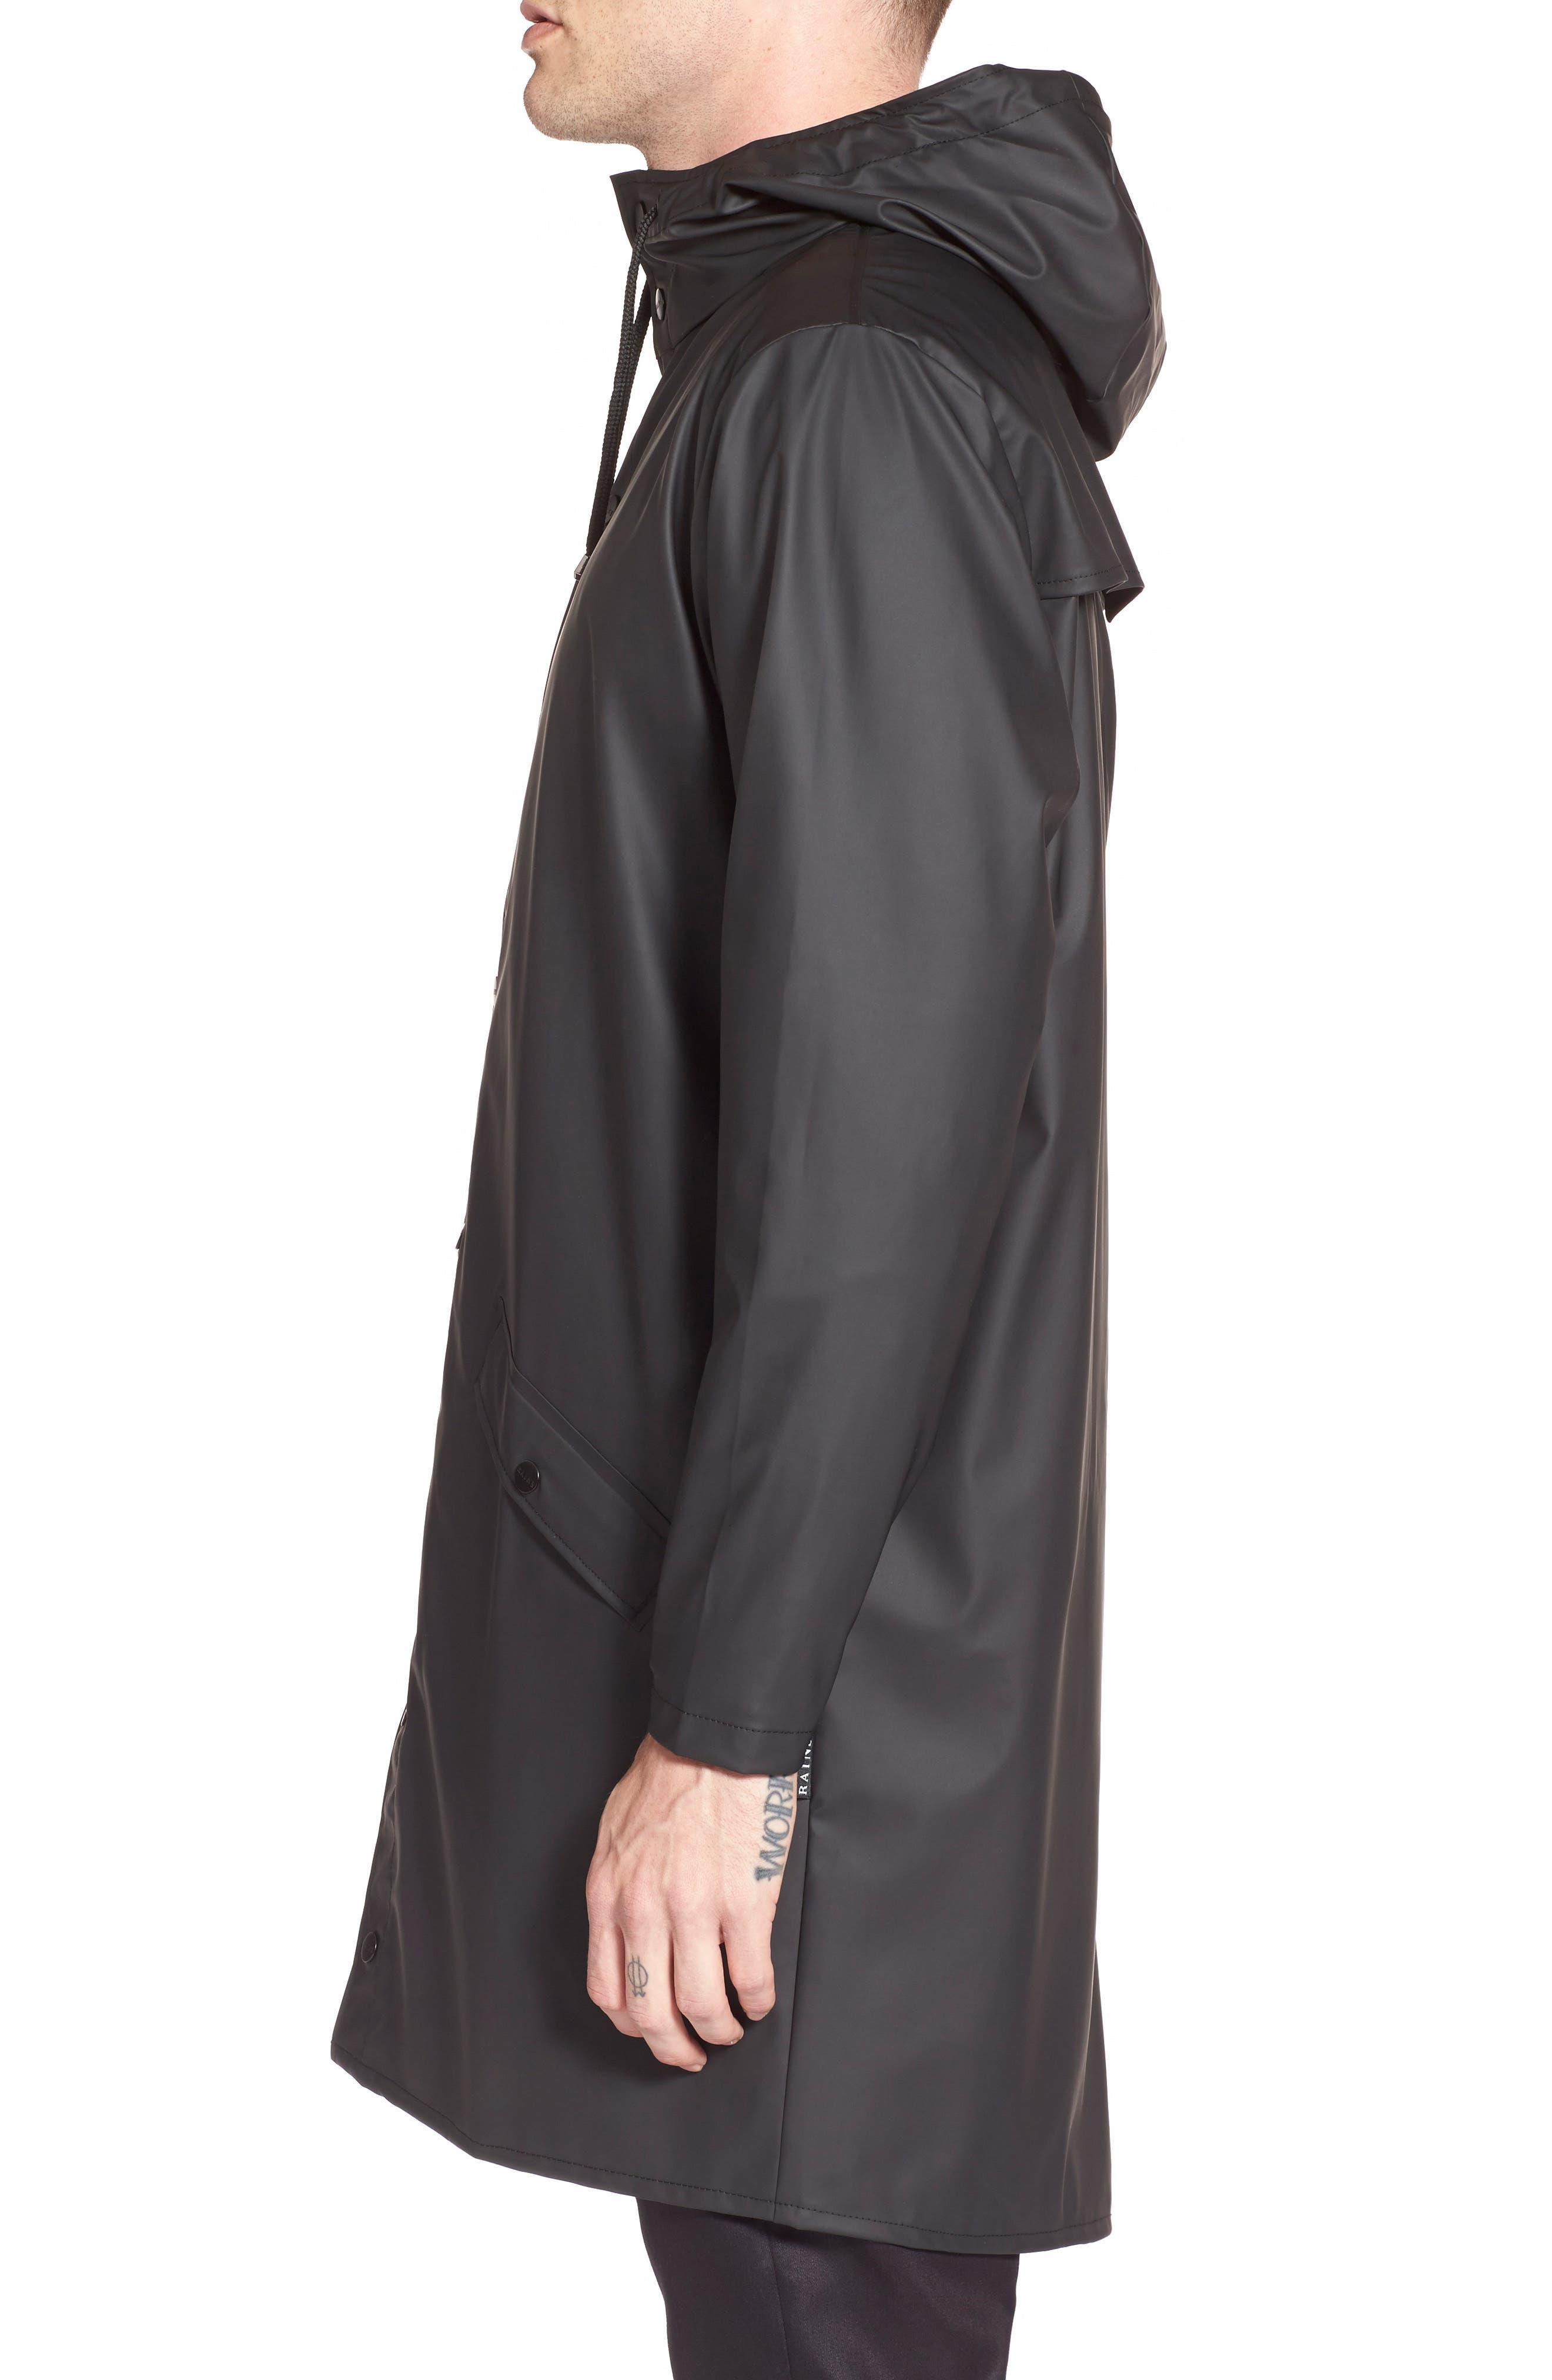 RAINS, Waterproof Hooded Long Rain Jacket, Alternate thumbnail 4, color, BLACK